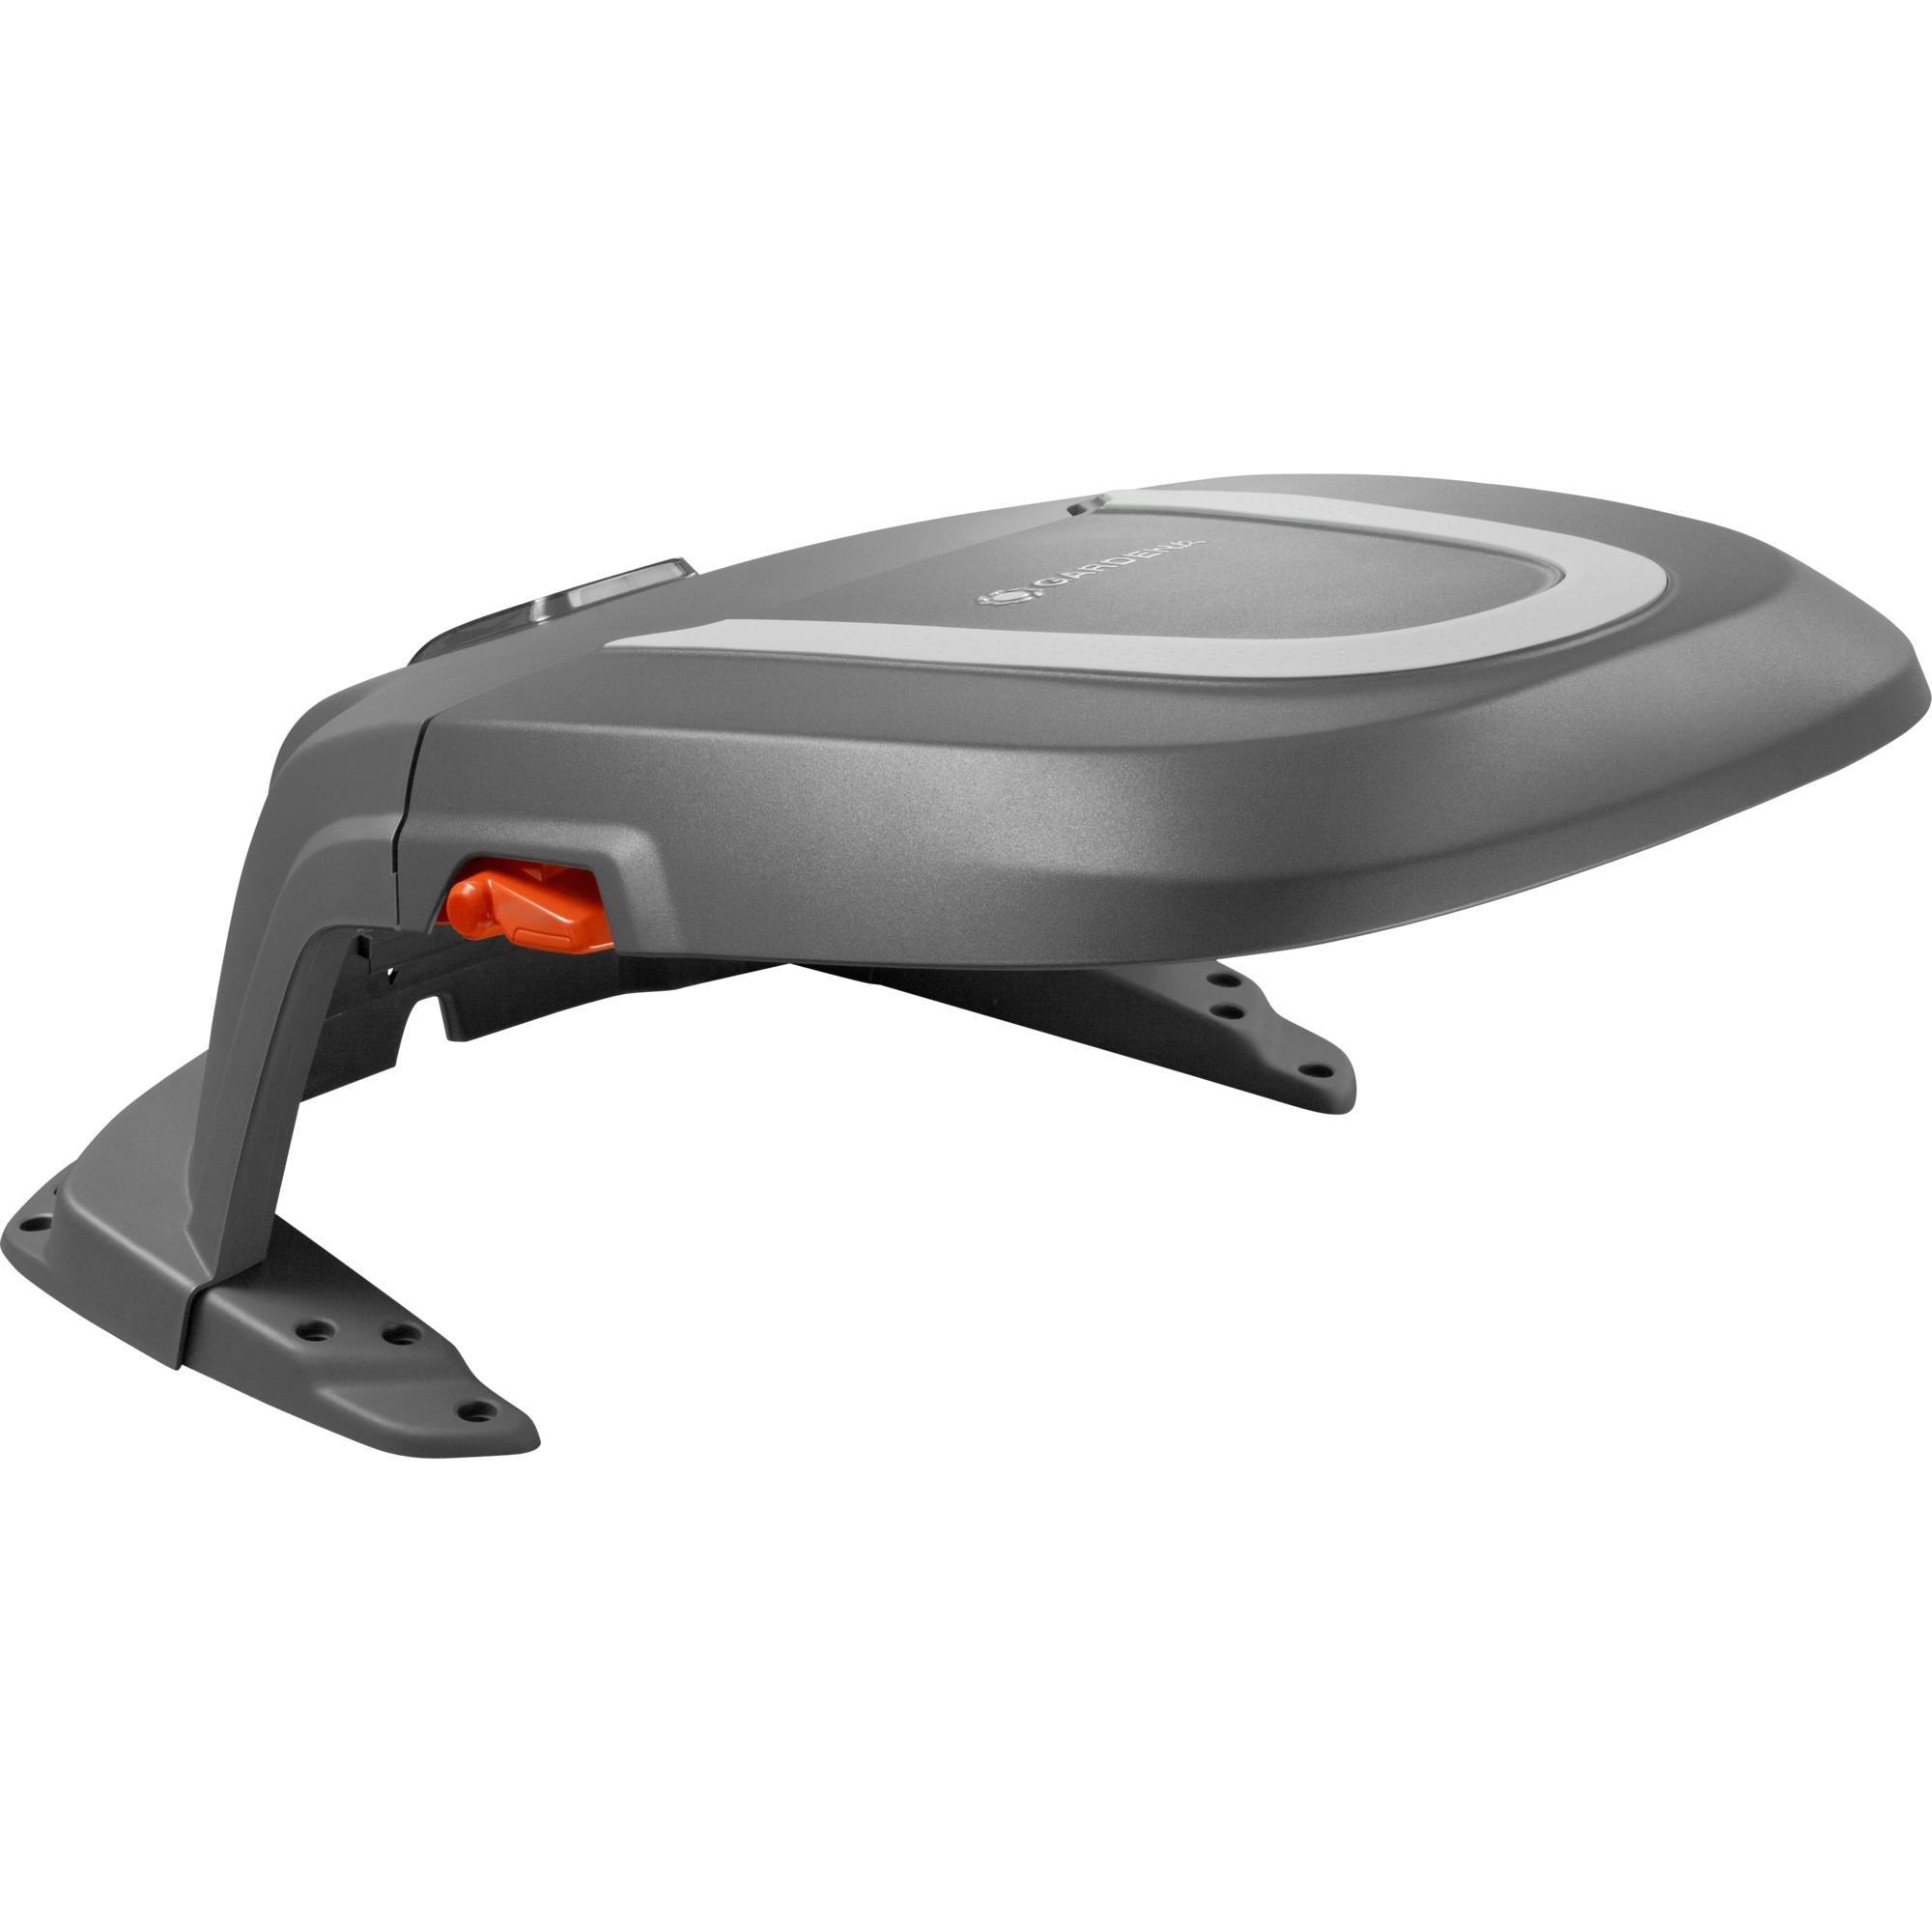 04011-20-robot-planeklipper